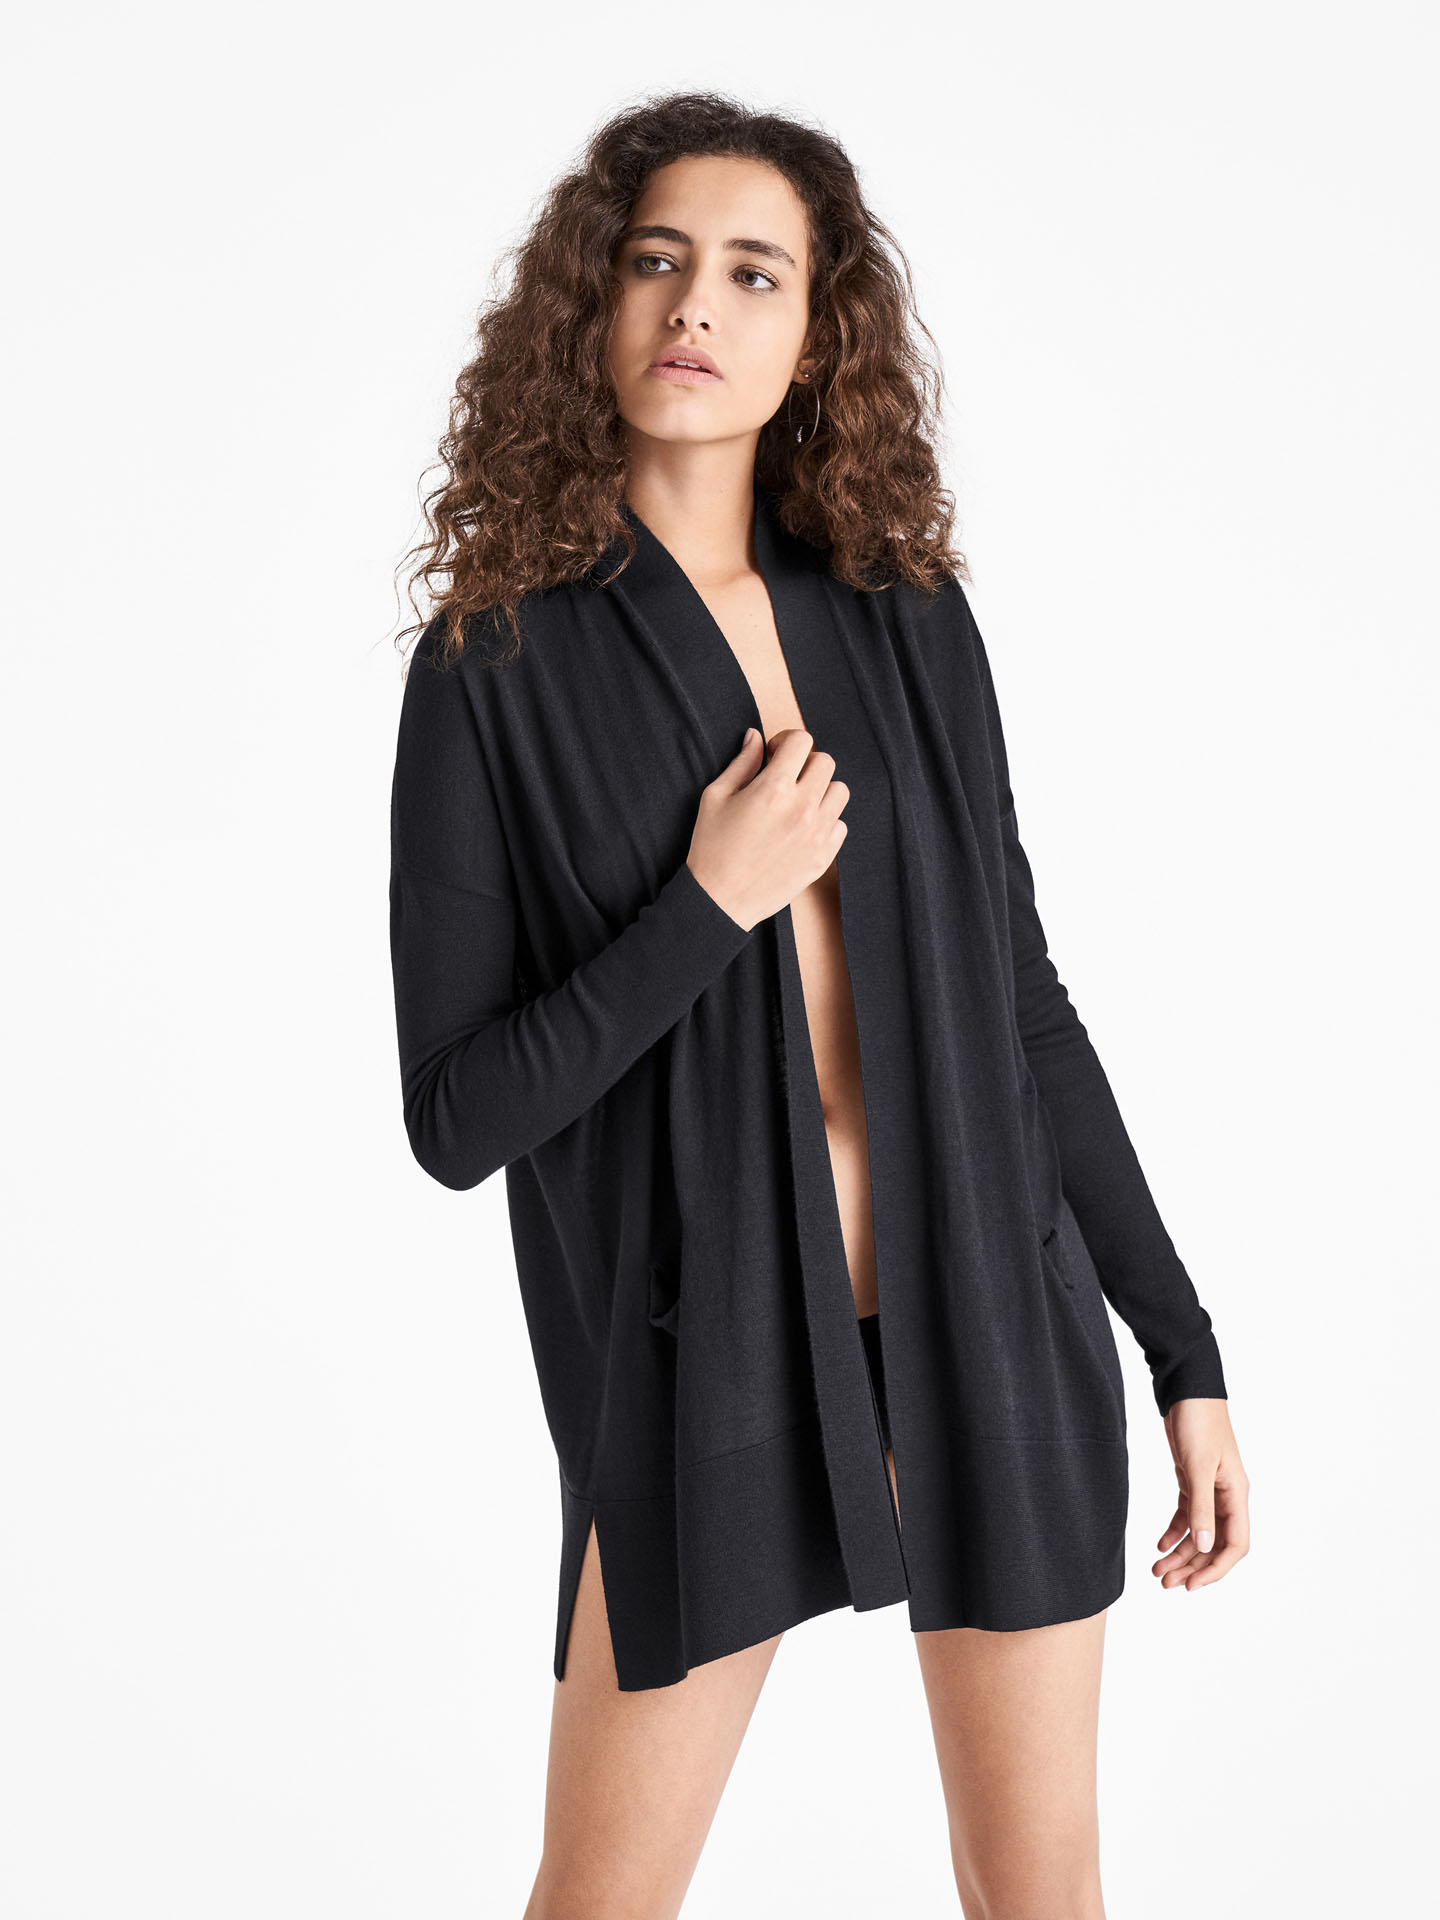 Wolford Apparel & Accessories > Clothing > Abbigliamento Donna Irene Cardigan